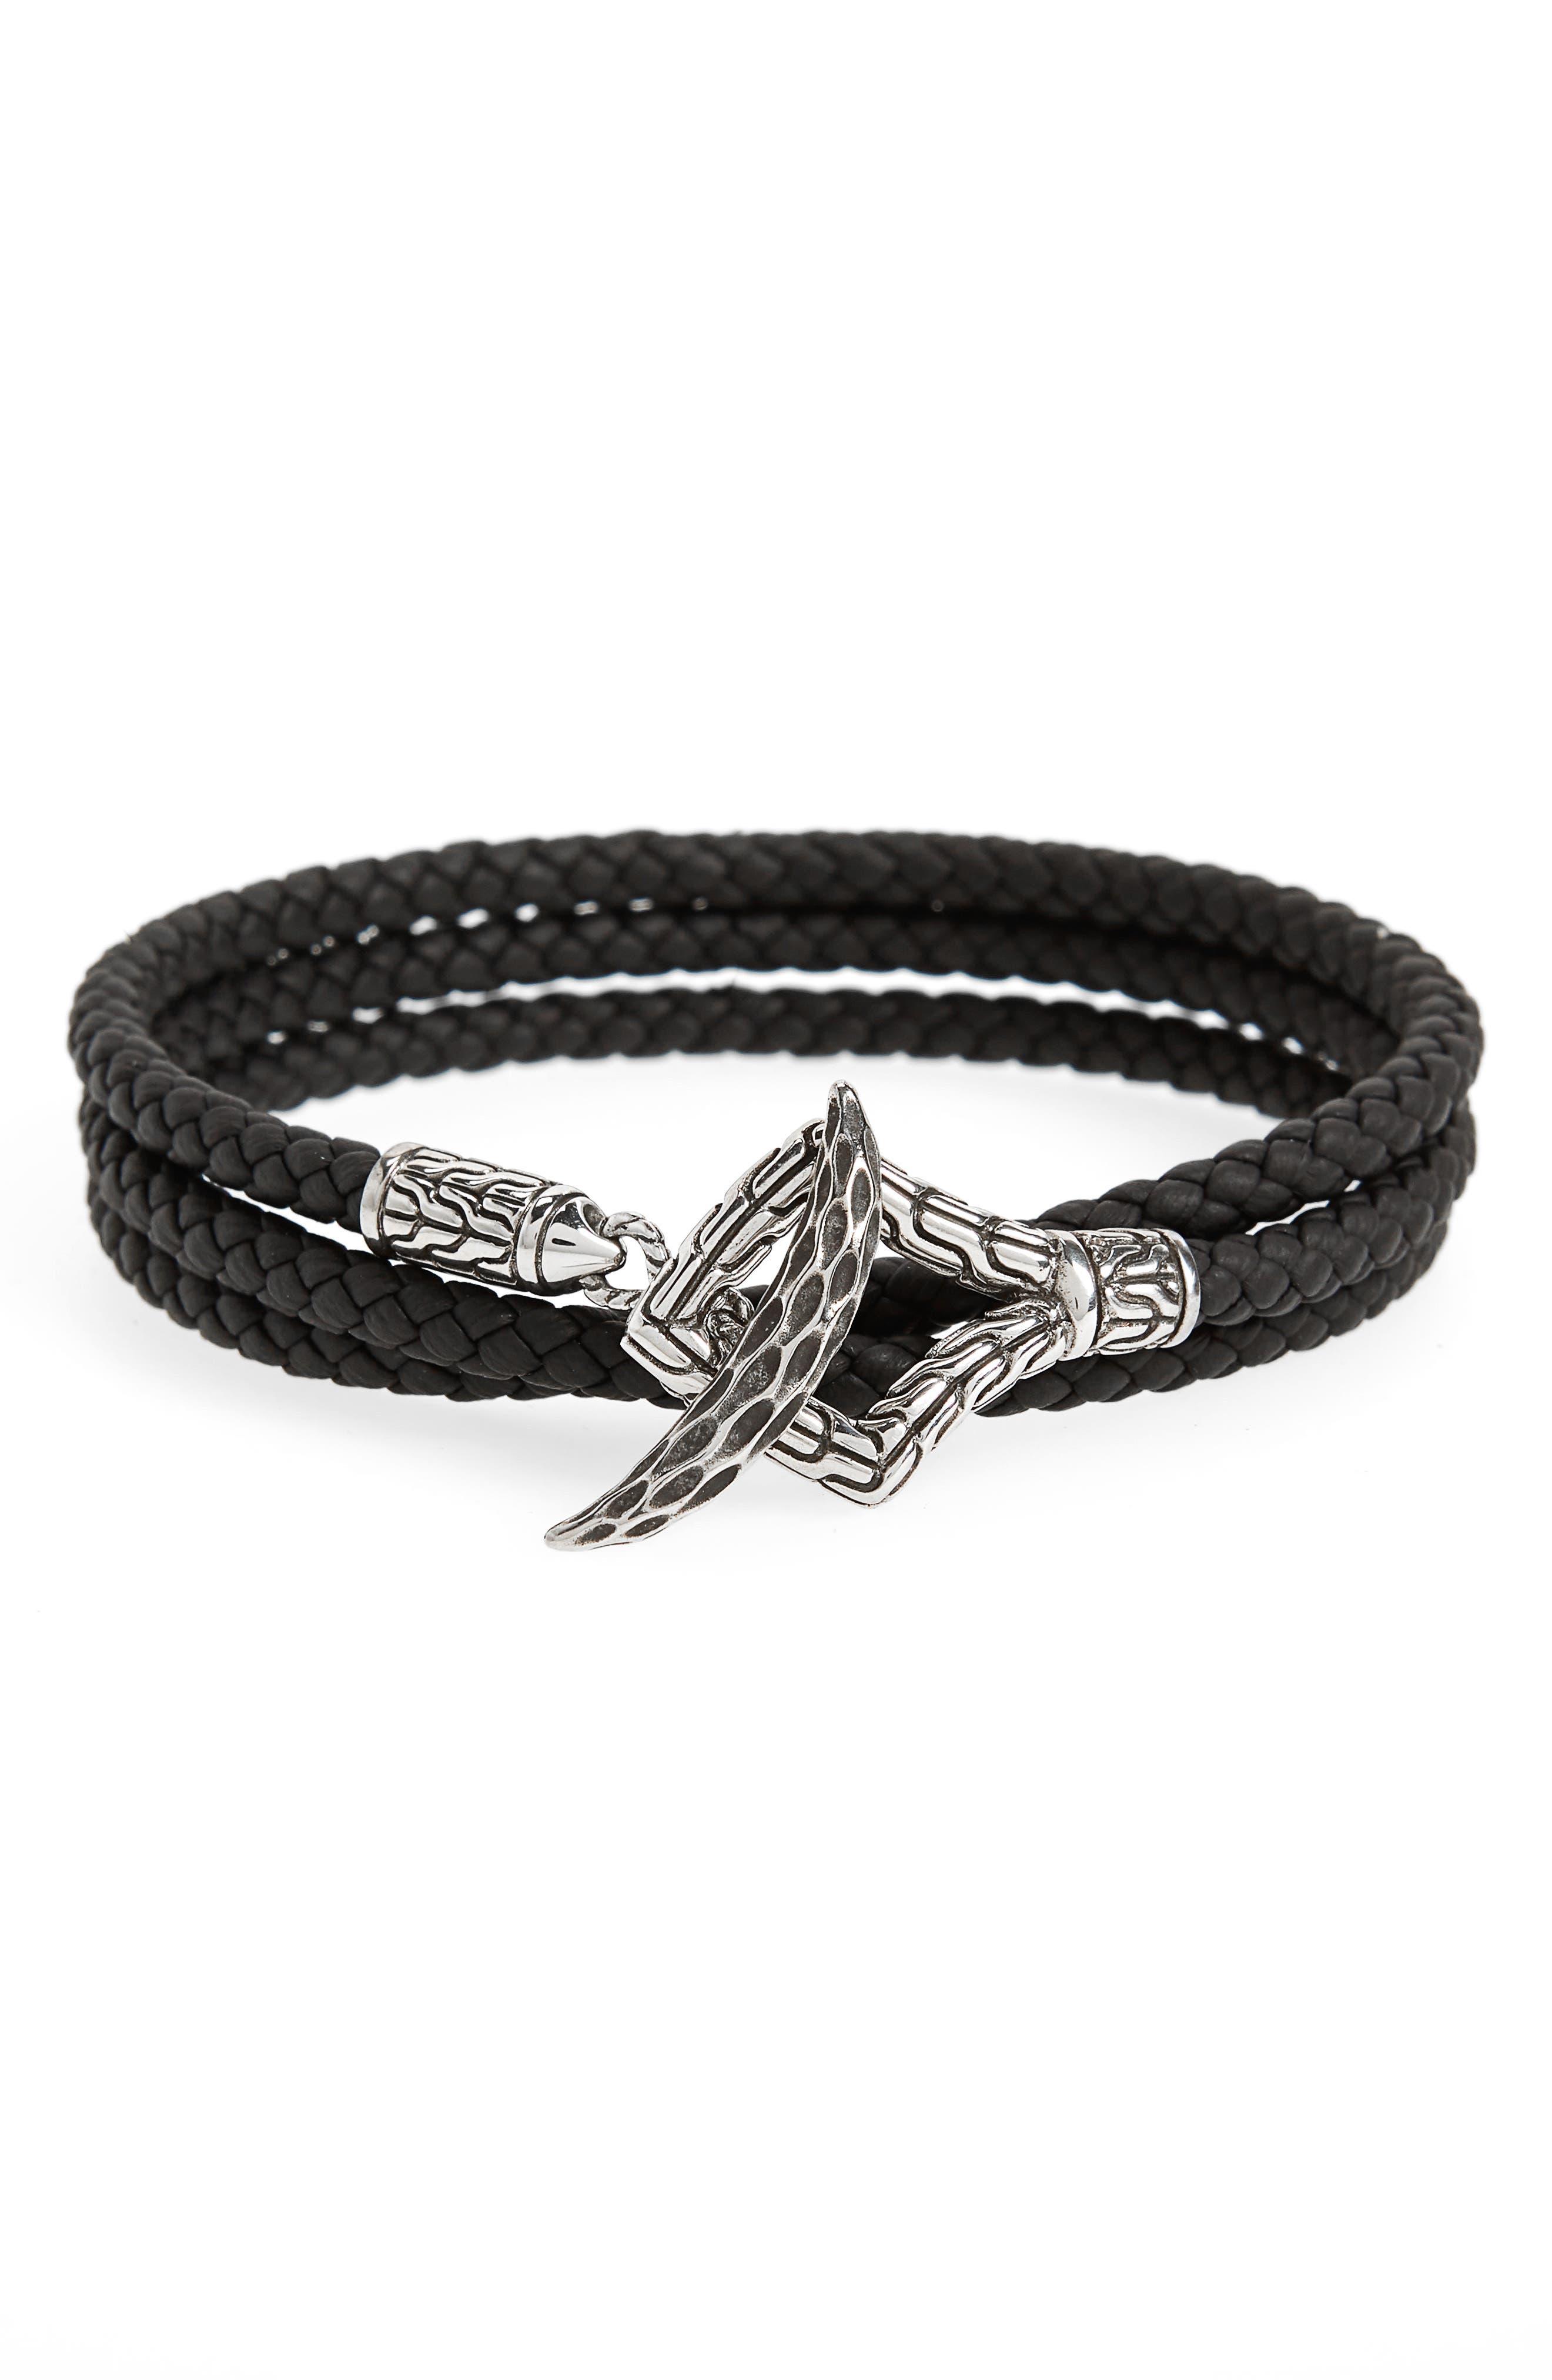 Legends Naga Triple Wrap Leather Bracelet,                             Main thumbnail 1, color,                             BLACK/ SILVER